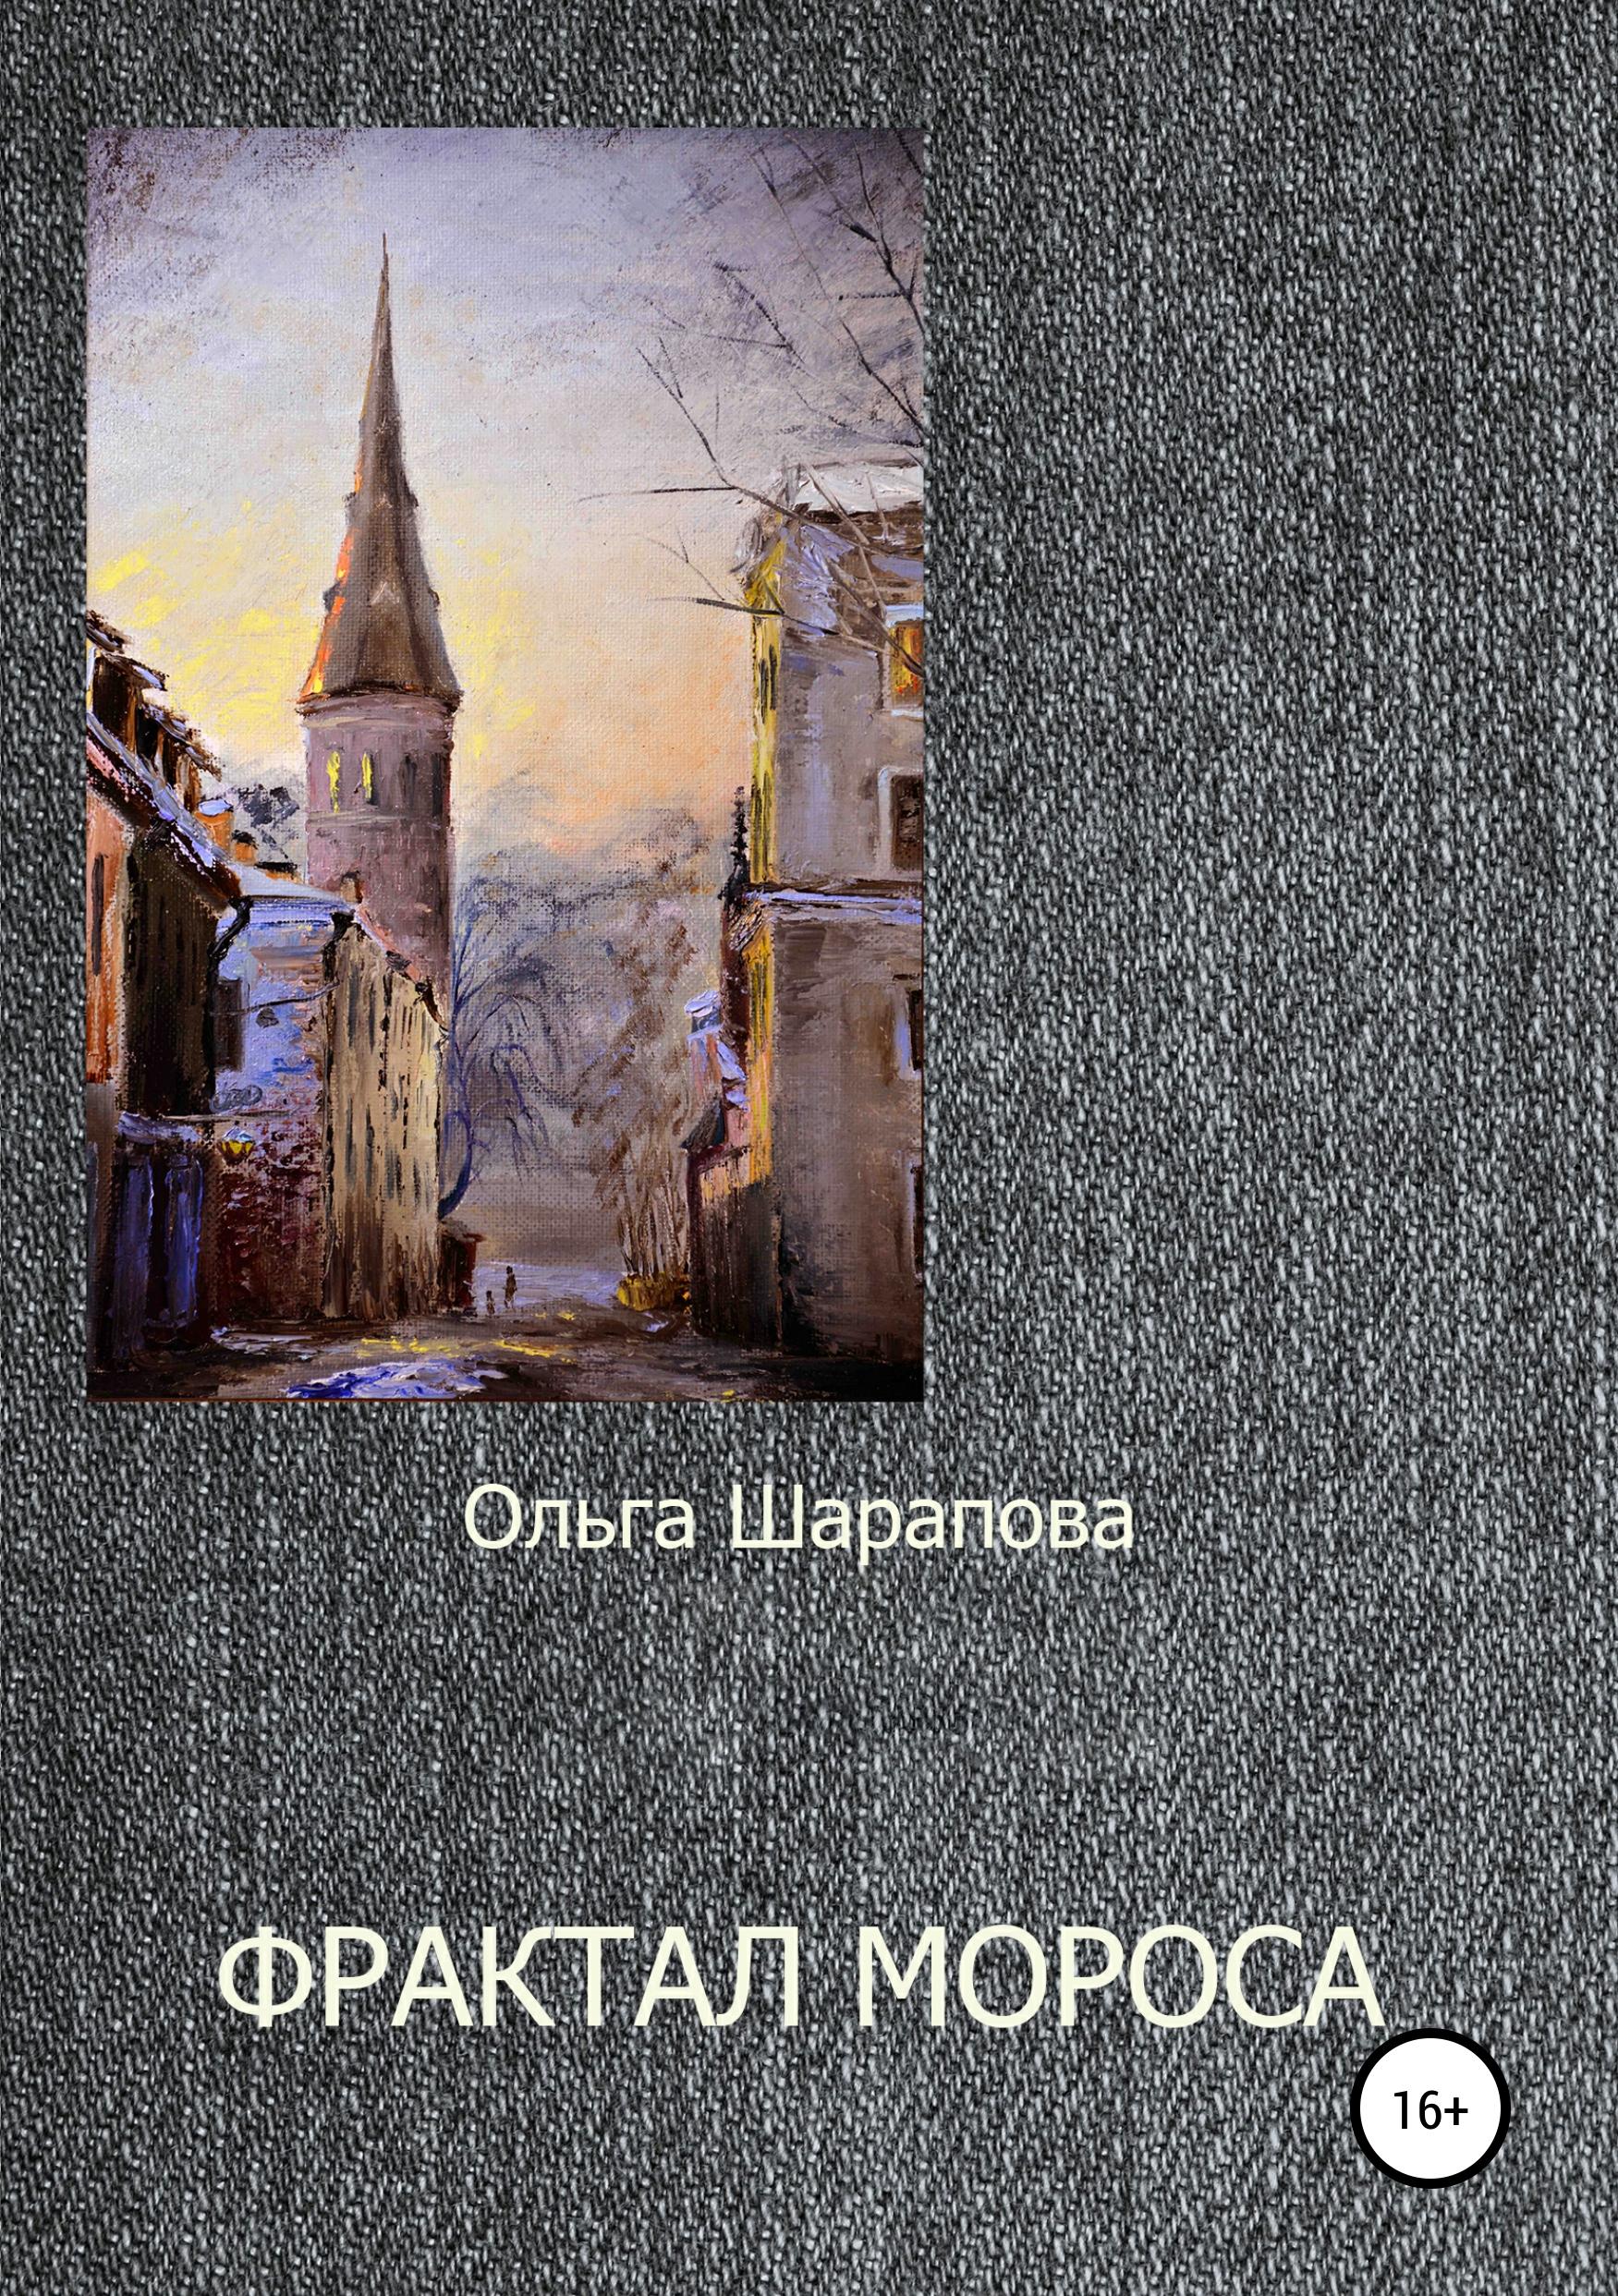 Ольга Шарапова - Фрактал Мороса